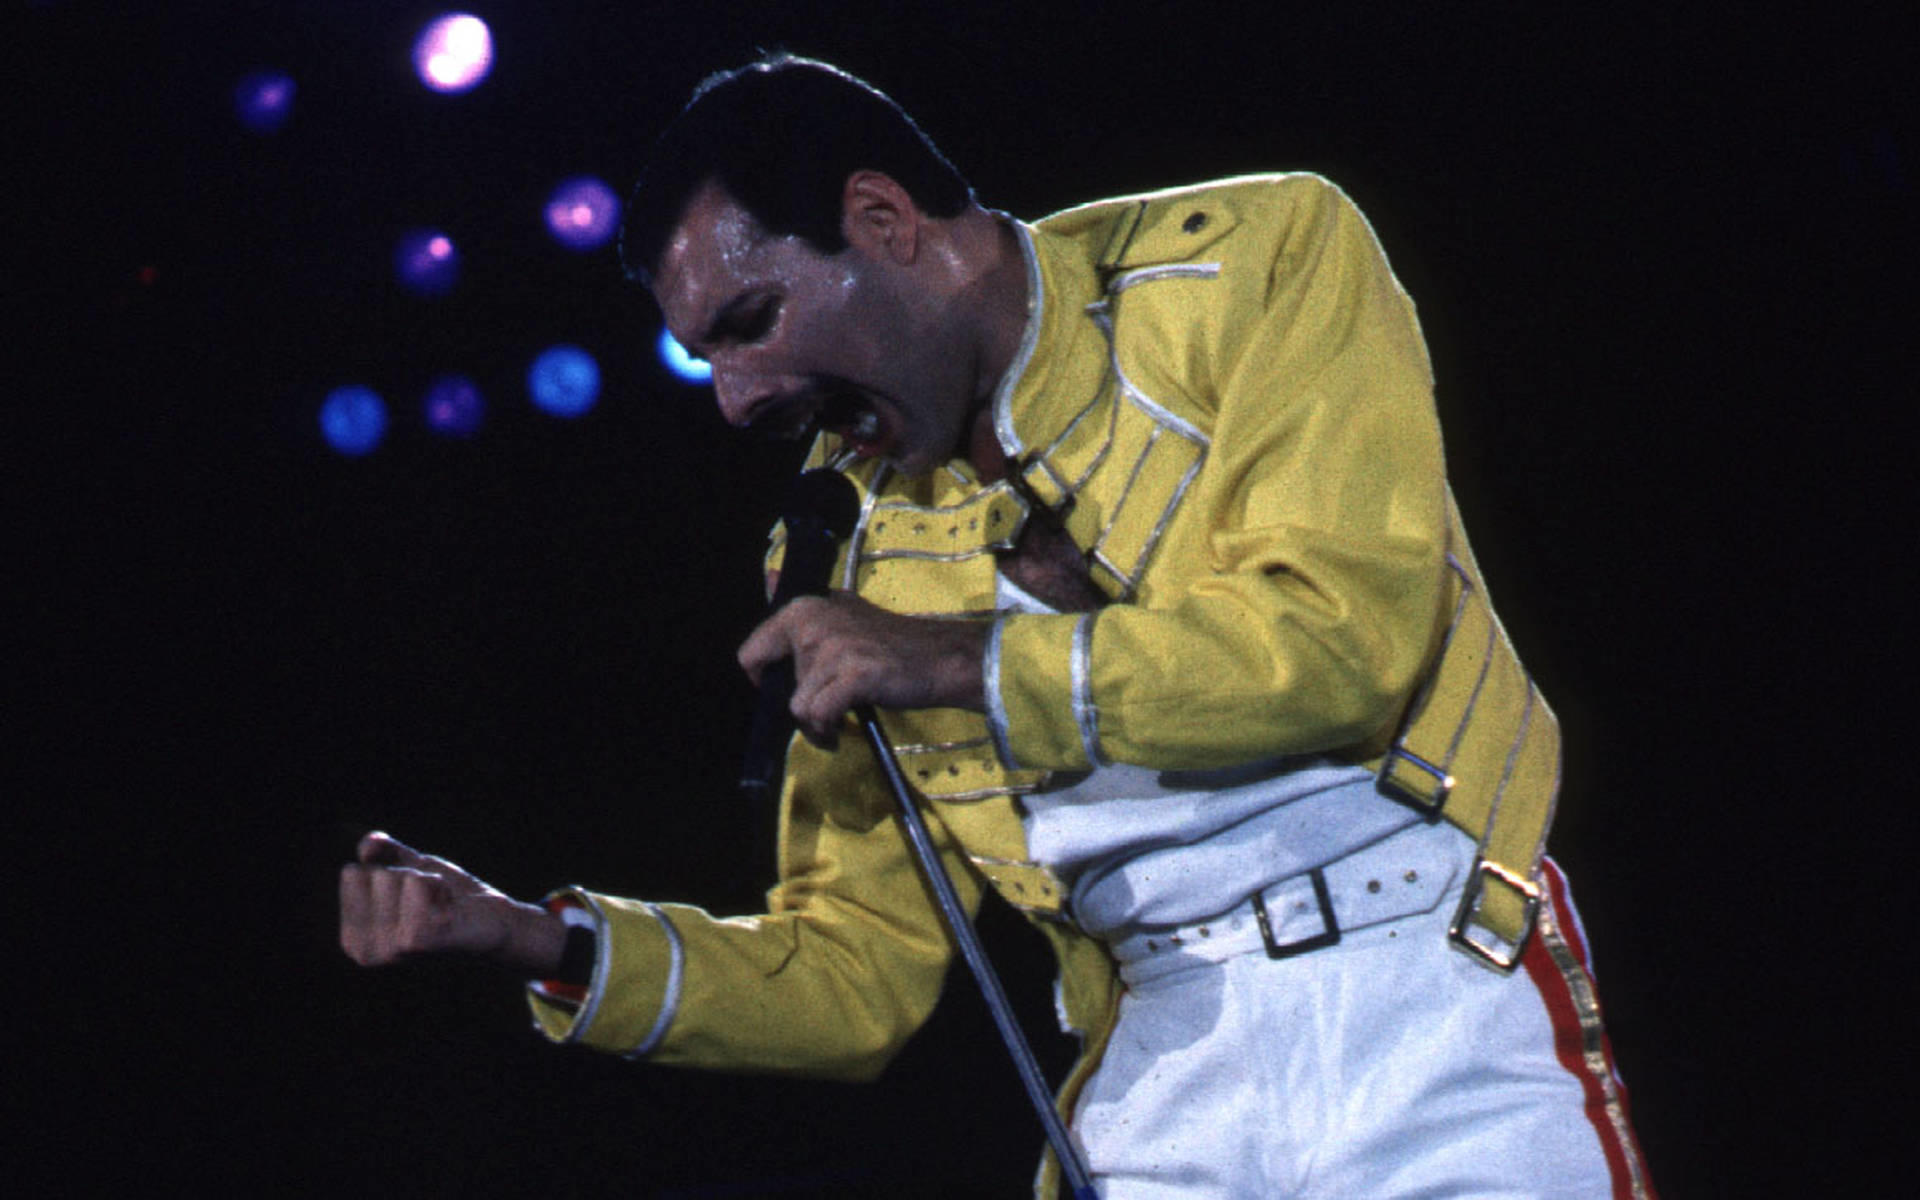 Auf Dauerschleife: 'Bohemian Rhapsody' knackt YouTube-Rekord